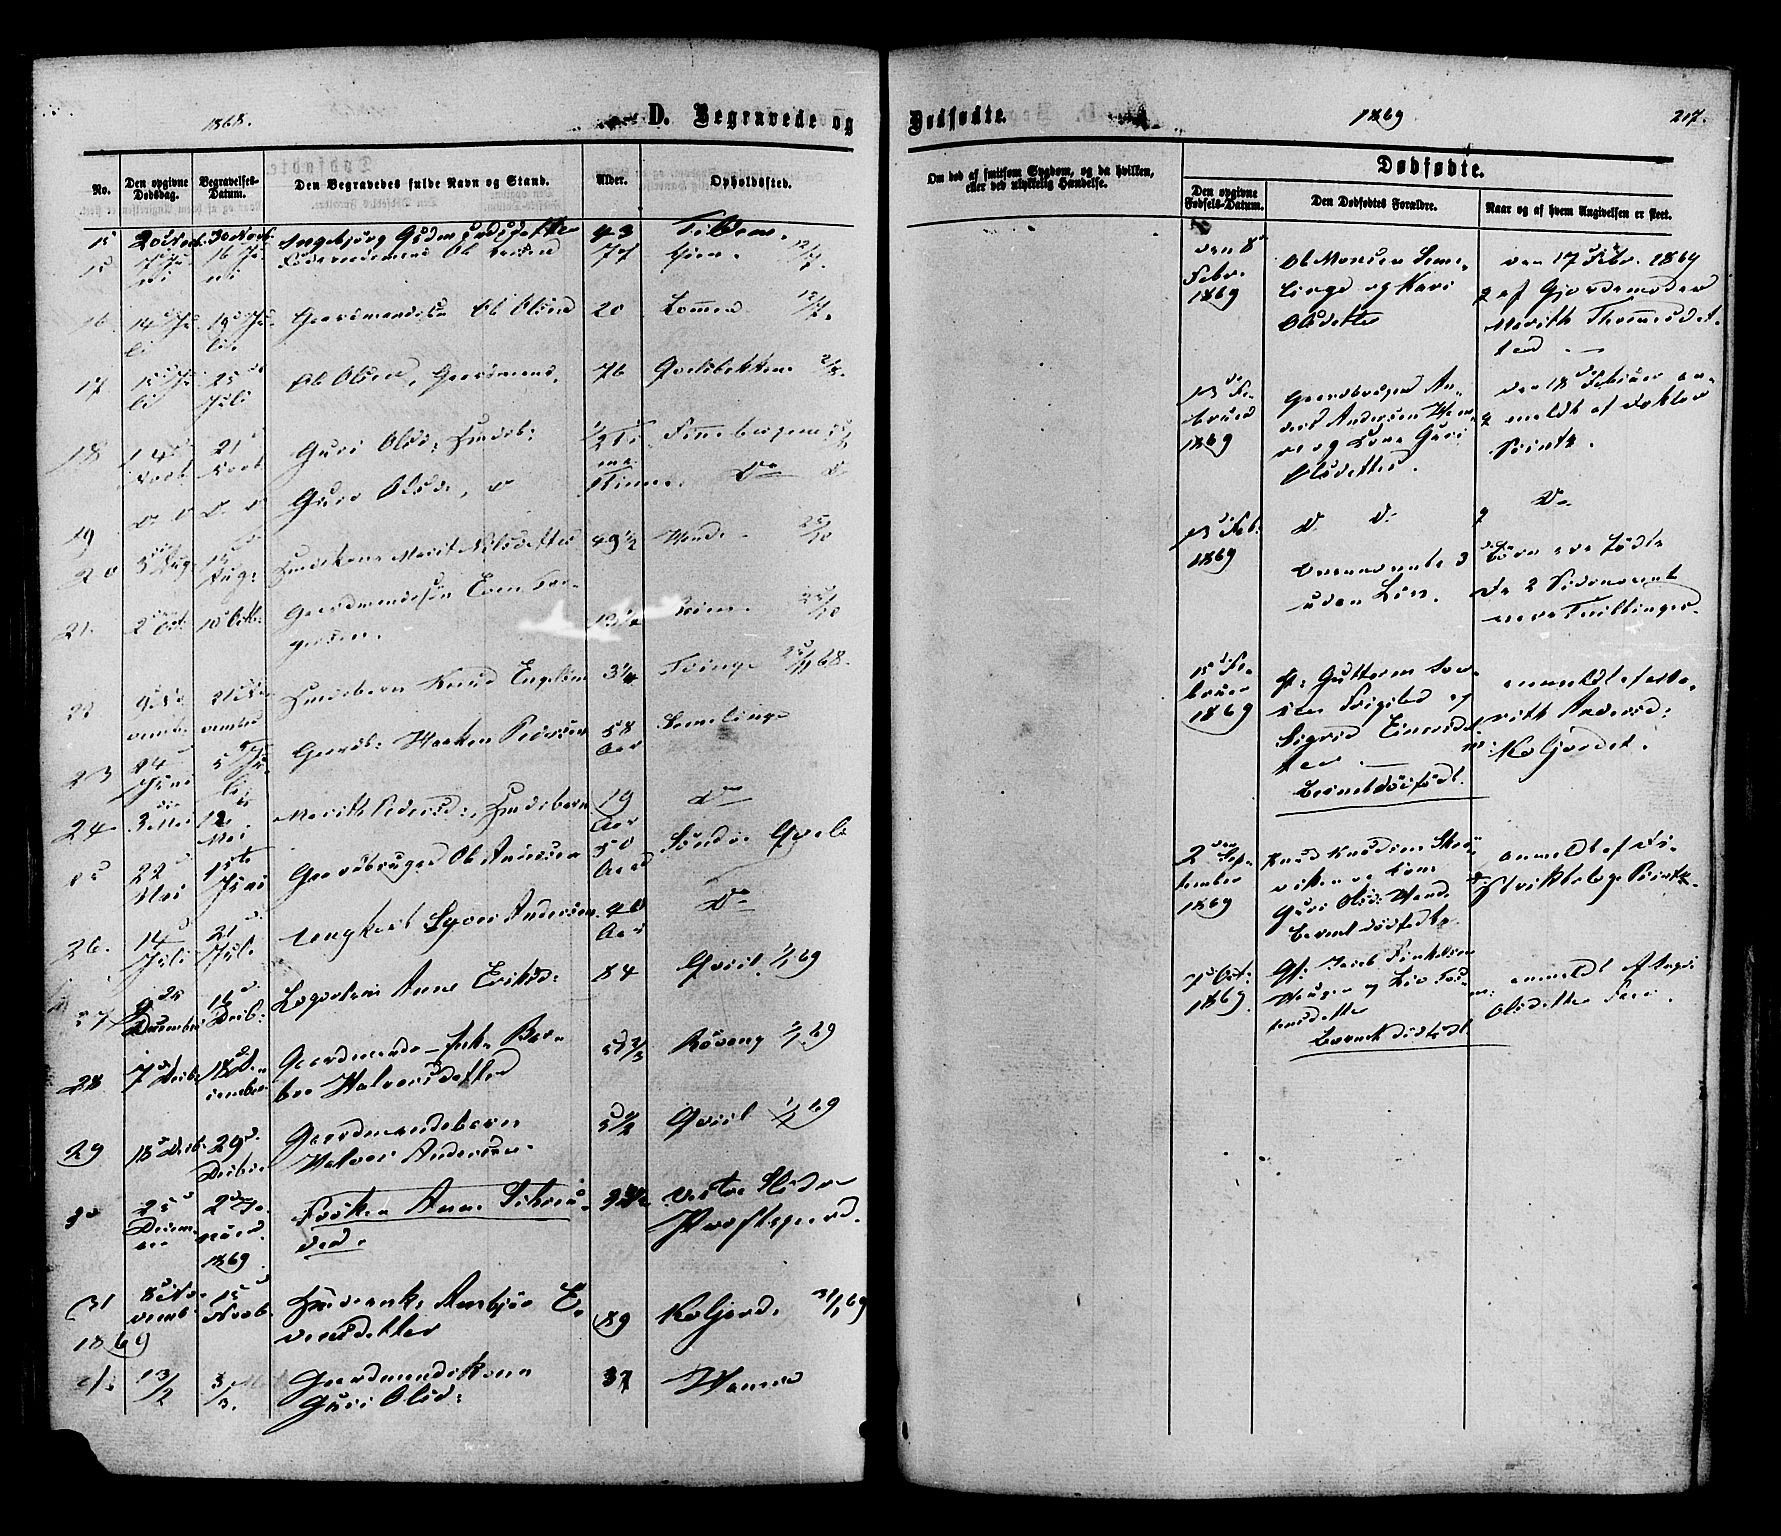 SAH, Vestre Slidre prestekontor, Ministerialbok nr. 3, 1865-1880, s. 217